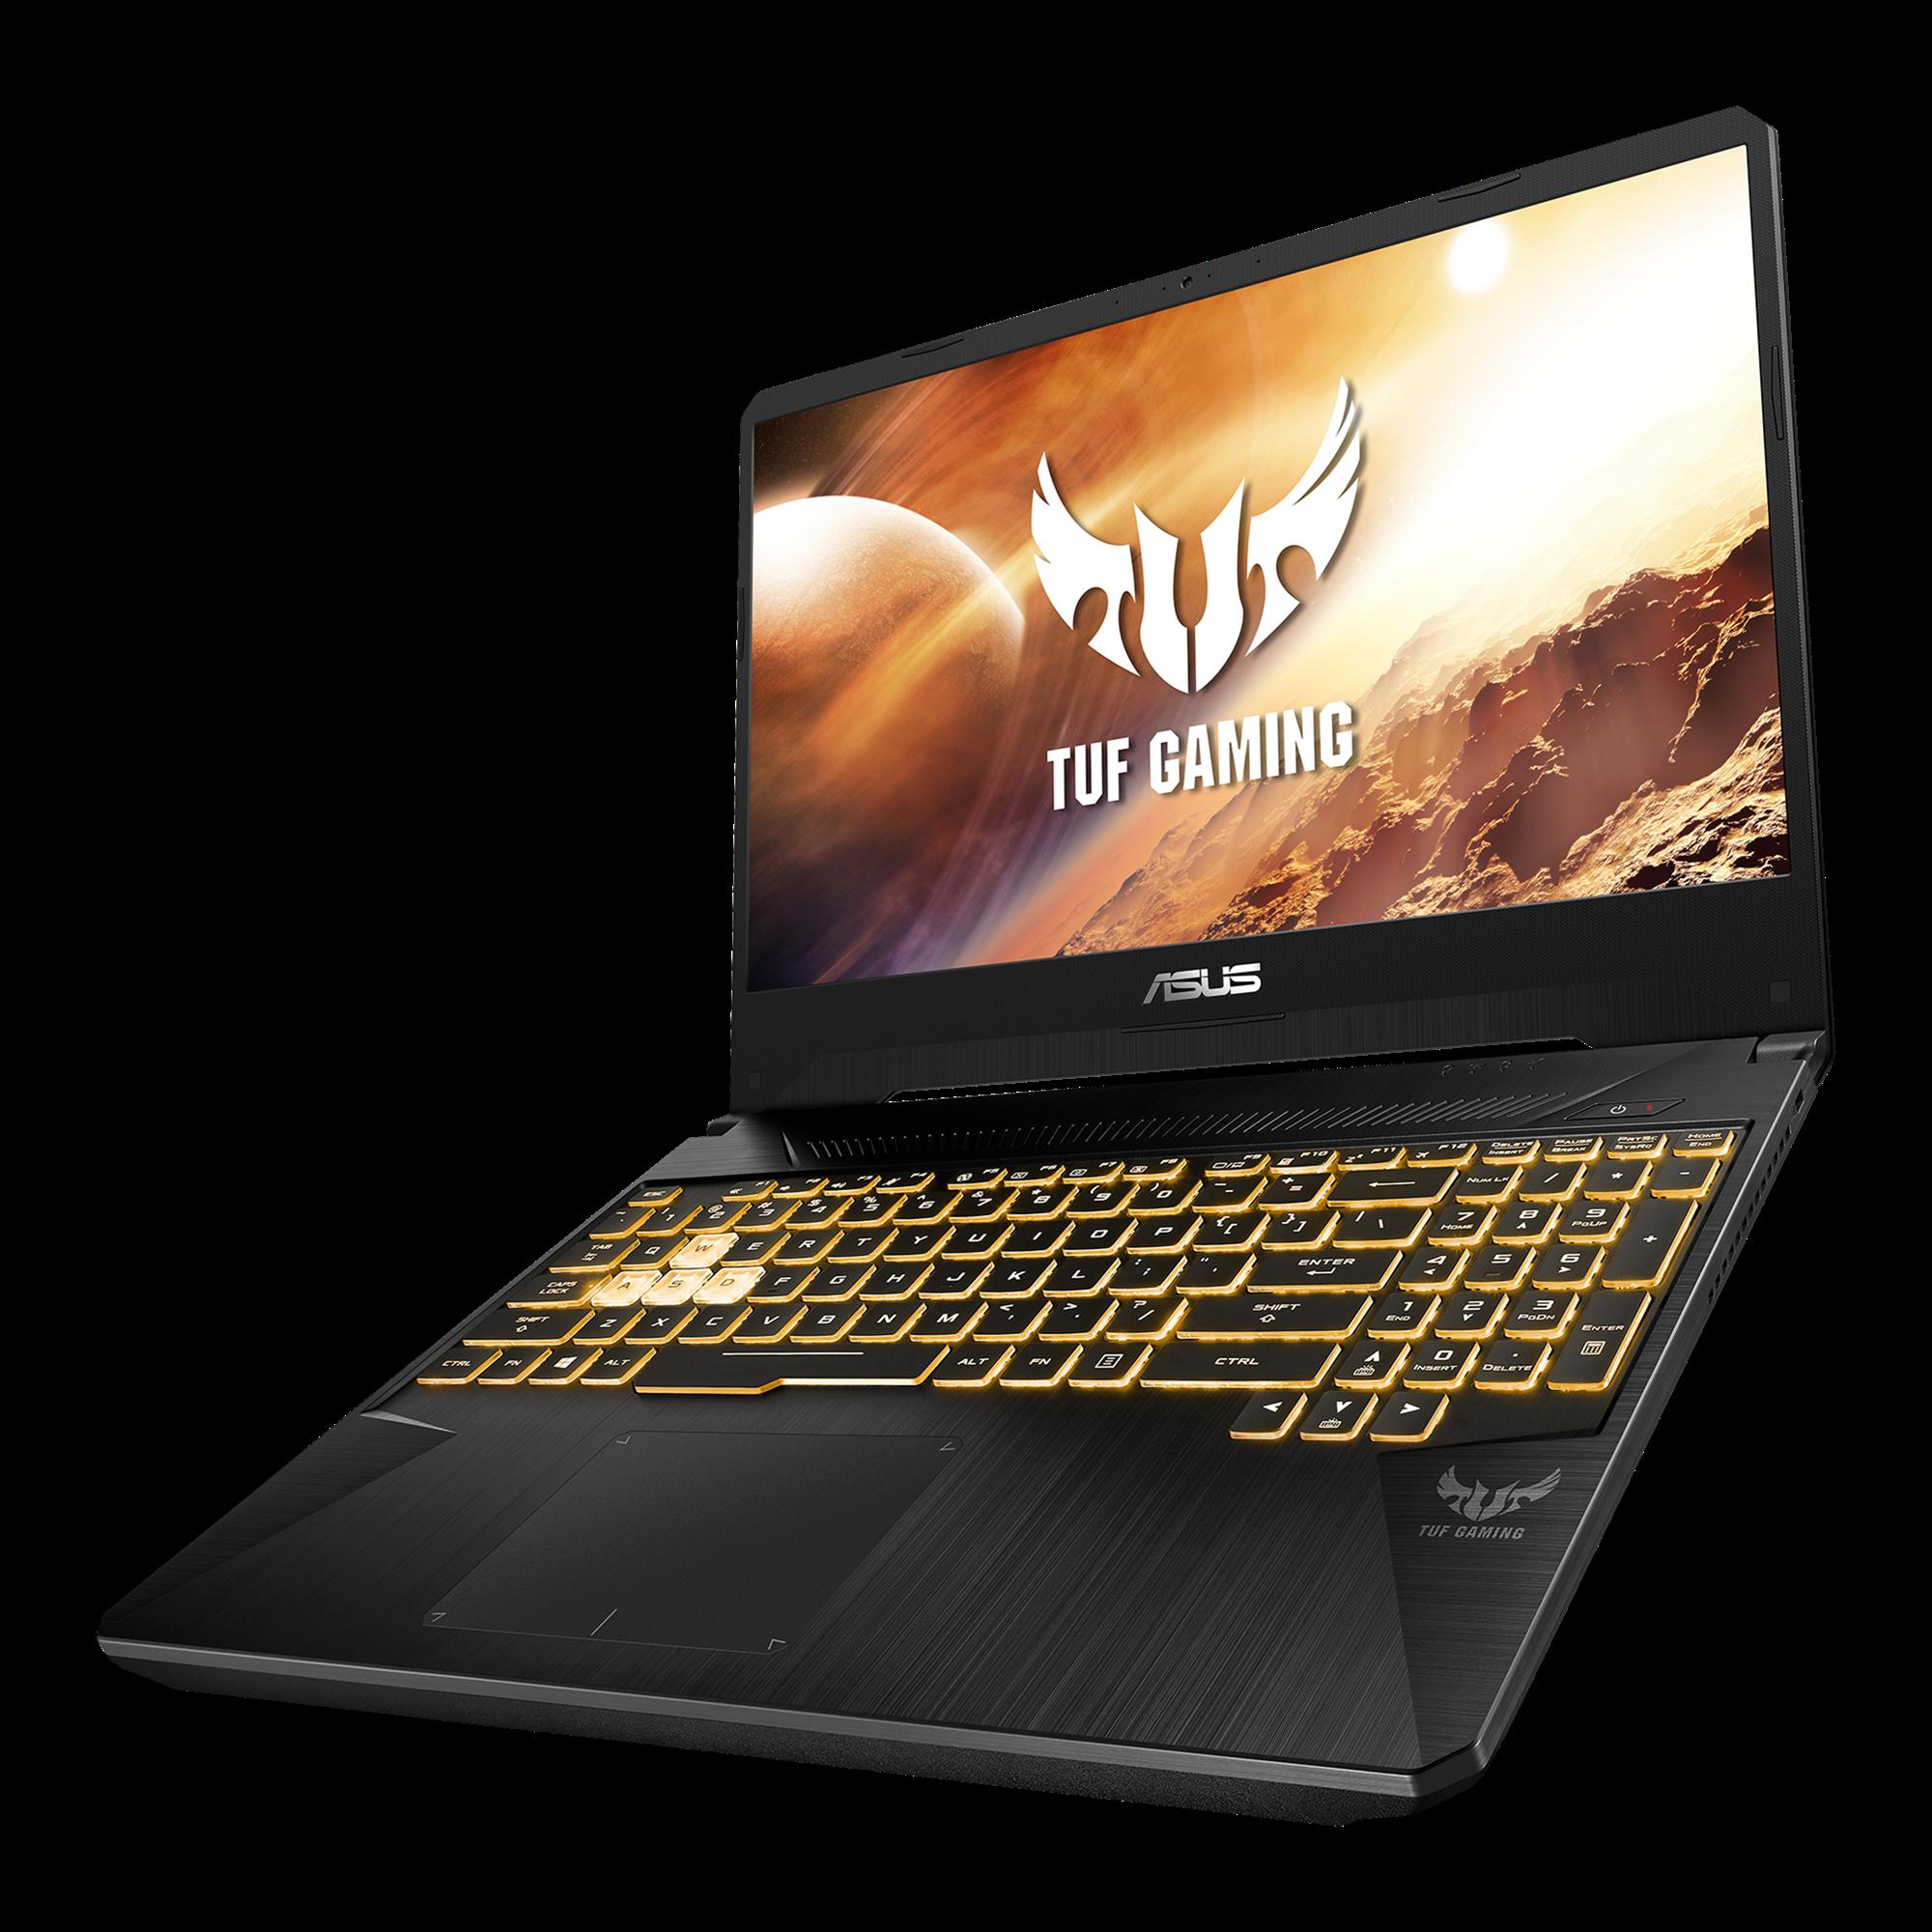 ASUS TUF Gaming FX505DV Laptops For Gaming ASUS Global